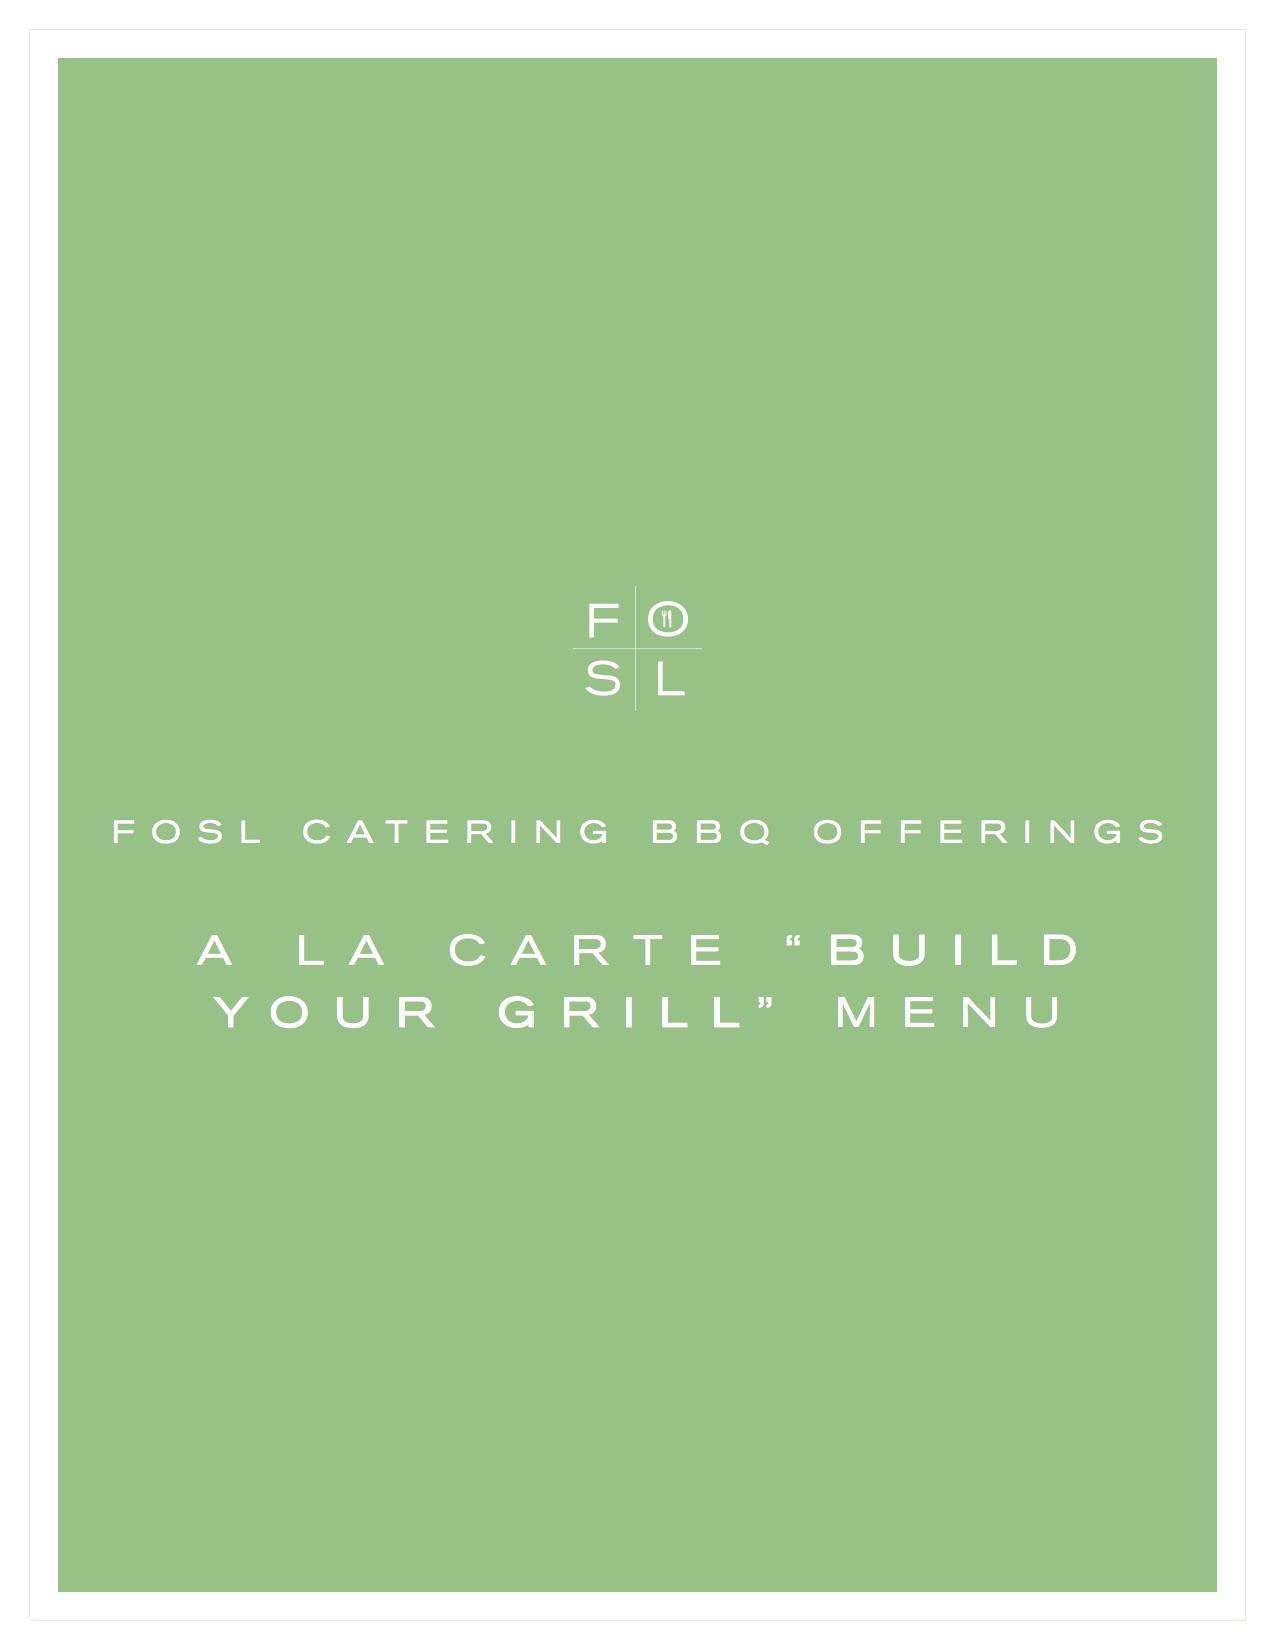 FOSL-Menu-BBQ.jpg